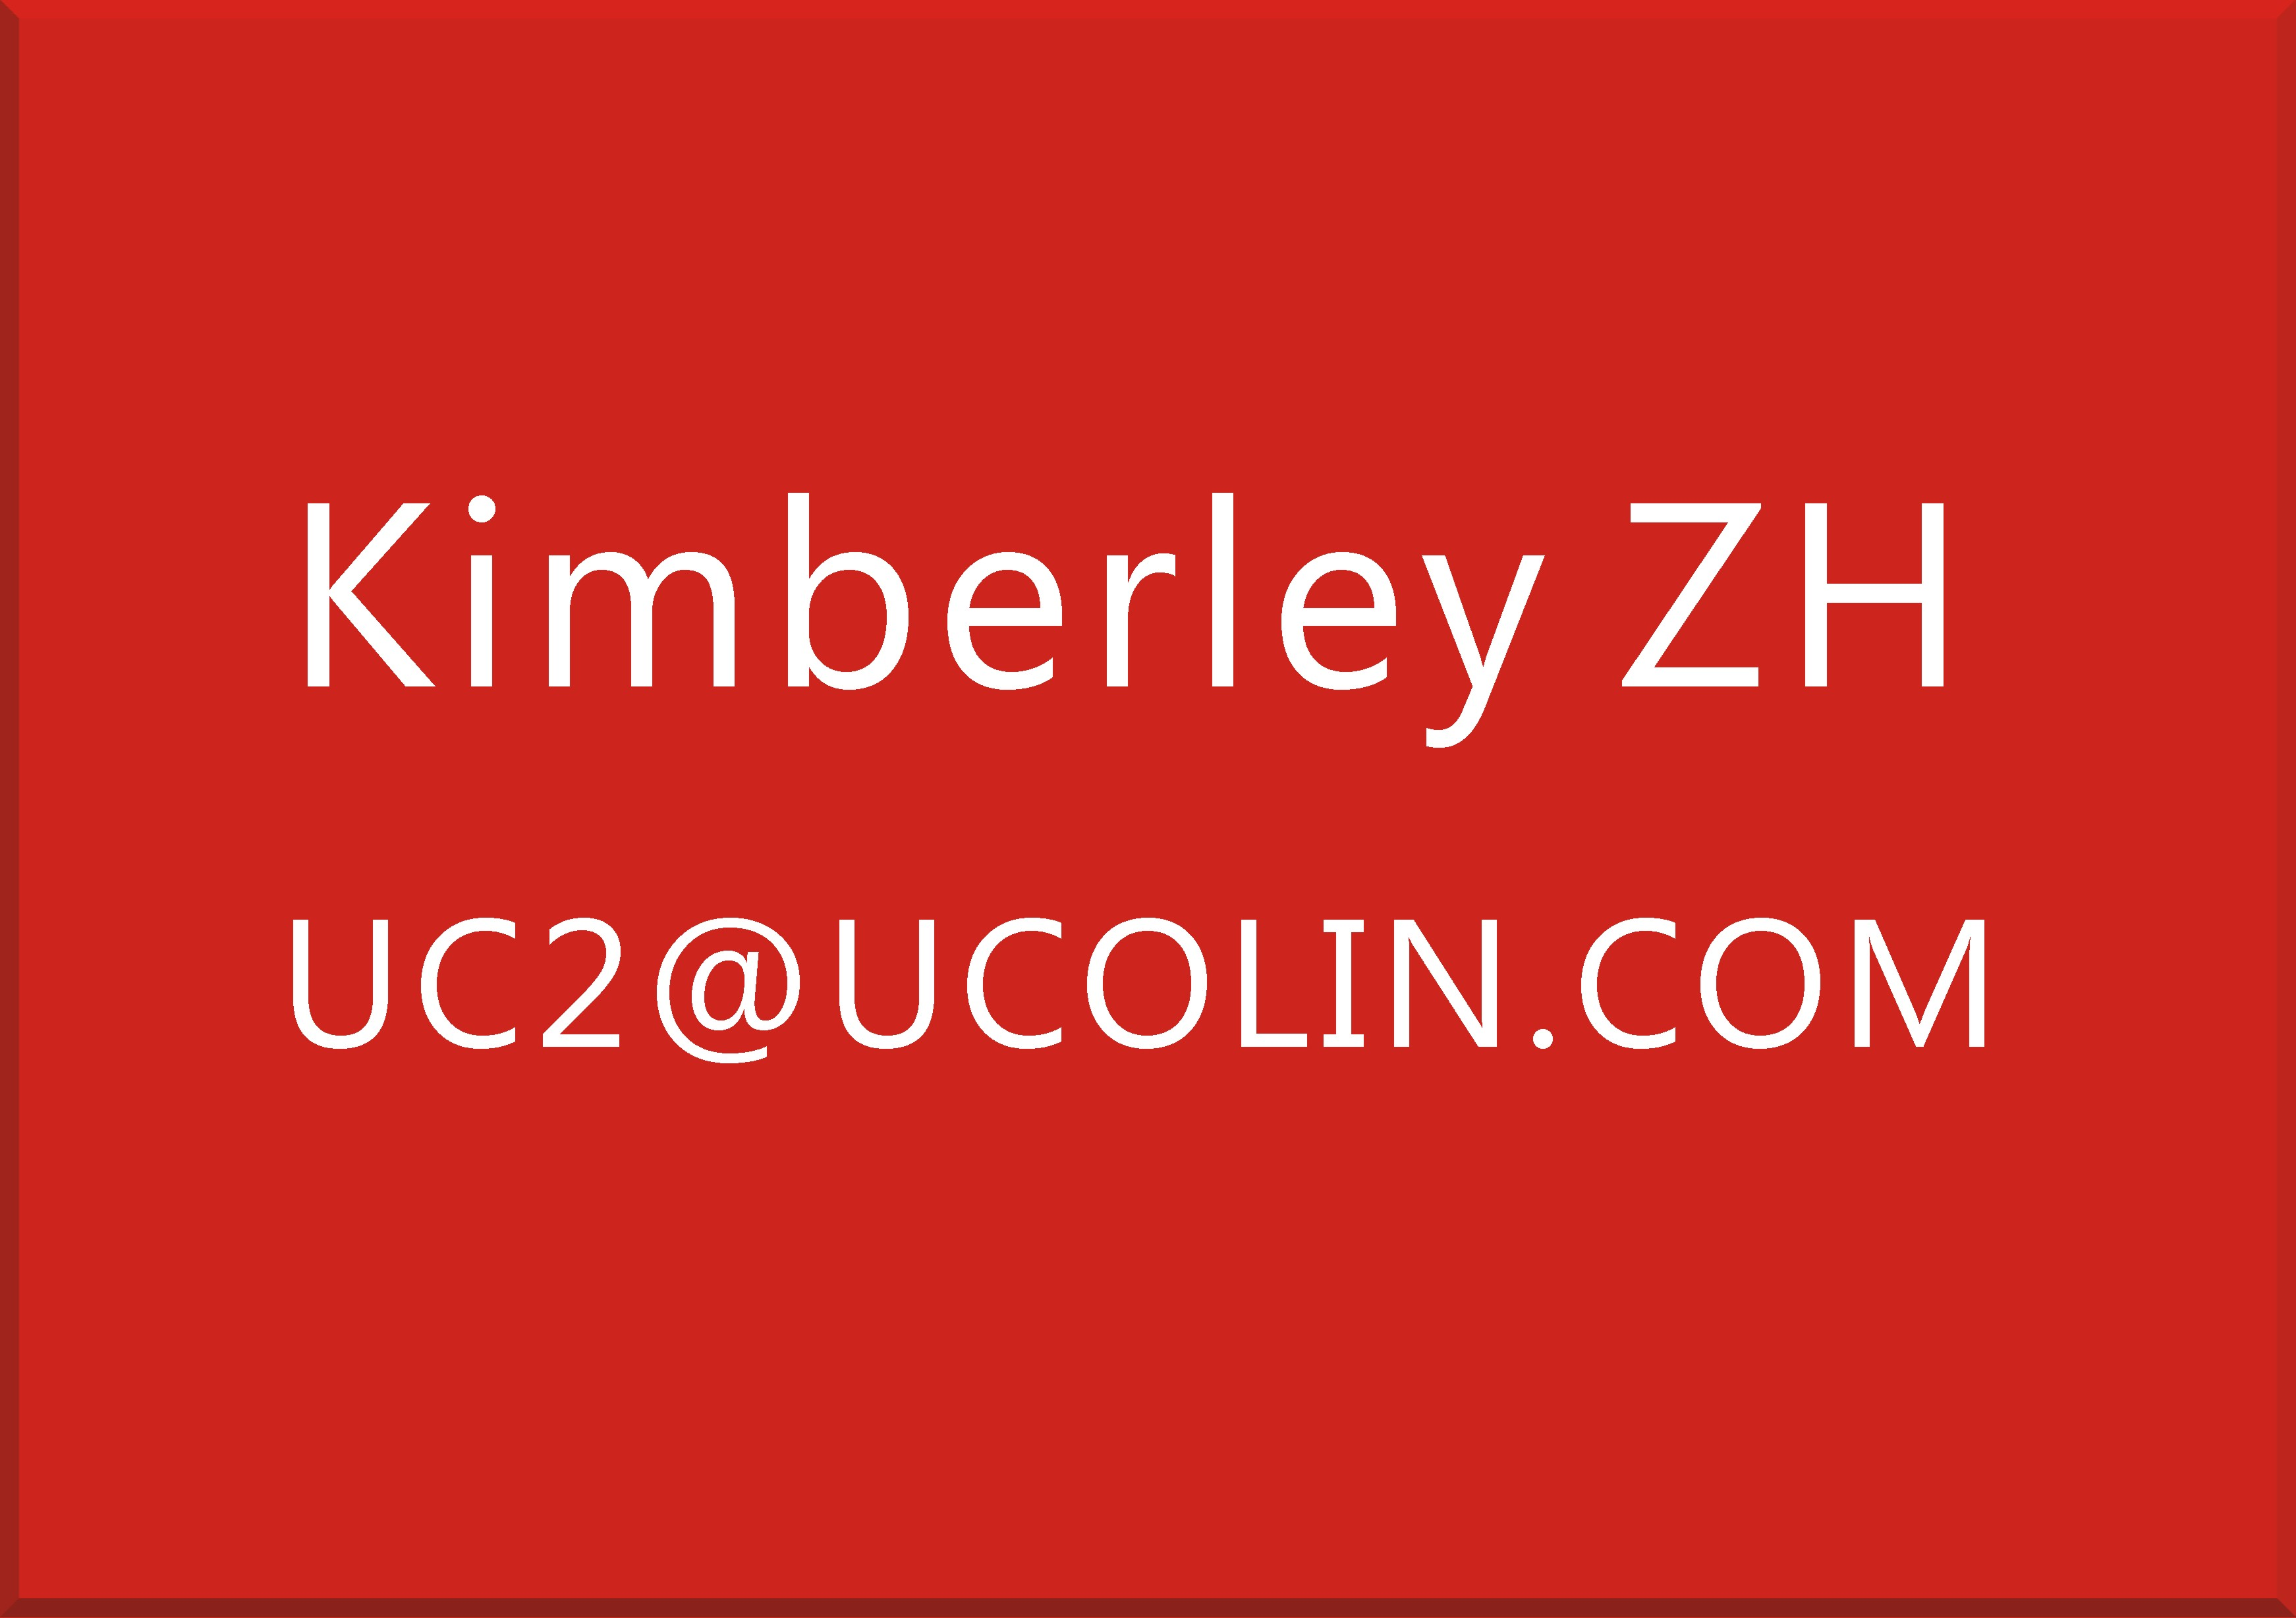 KIMBERLEY UC2@UCOLIN.COM